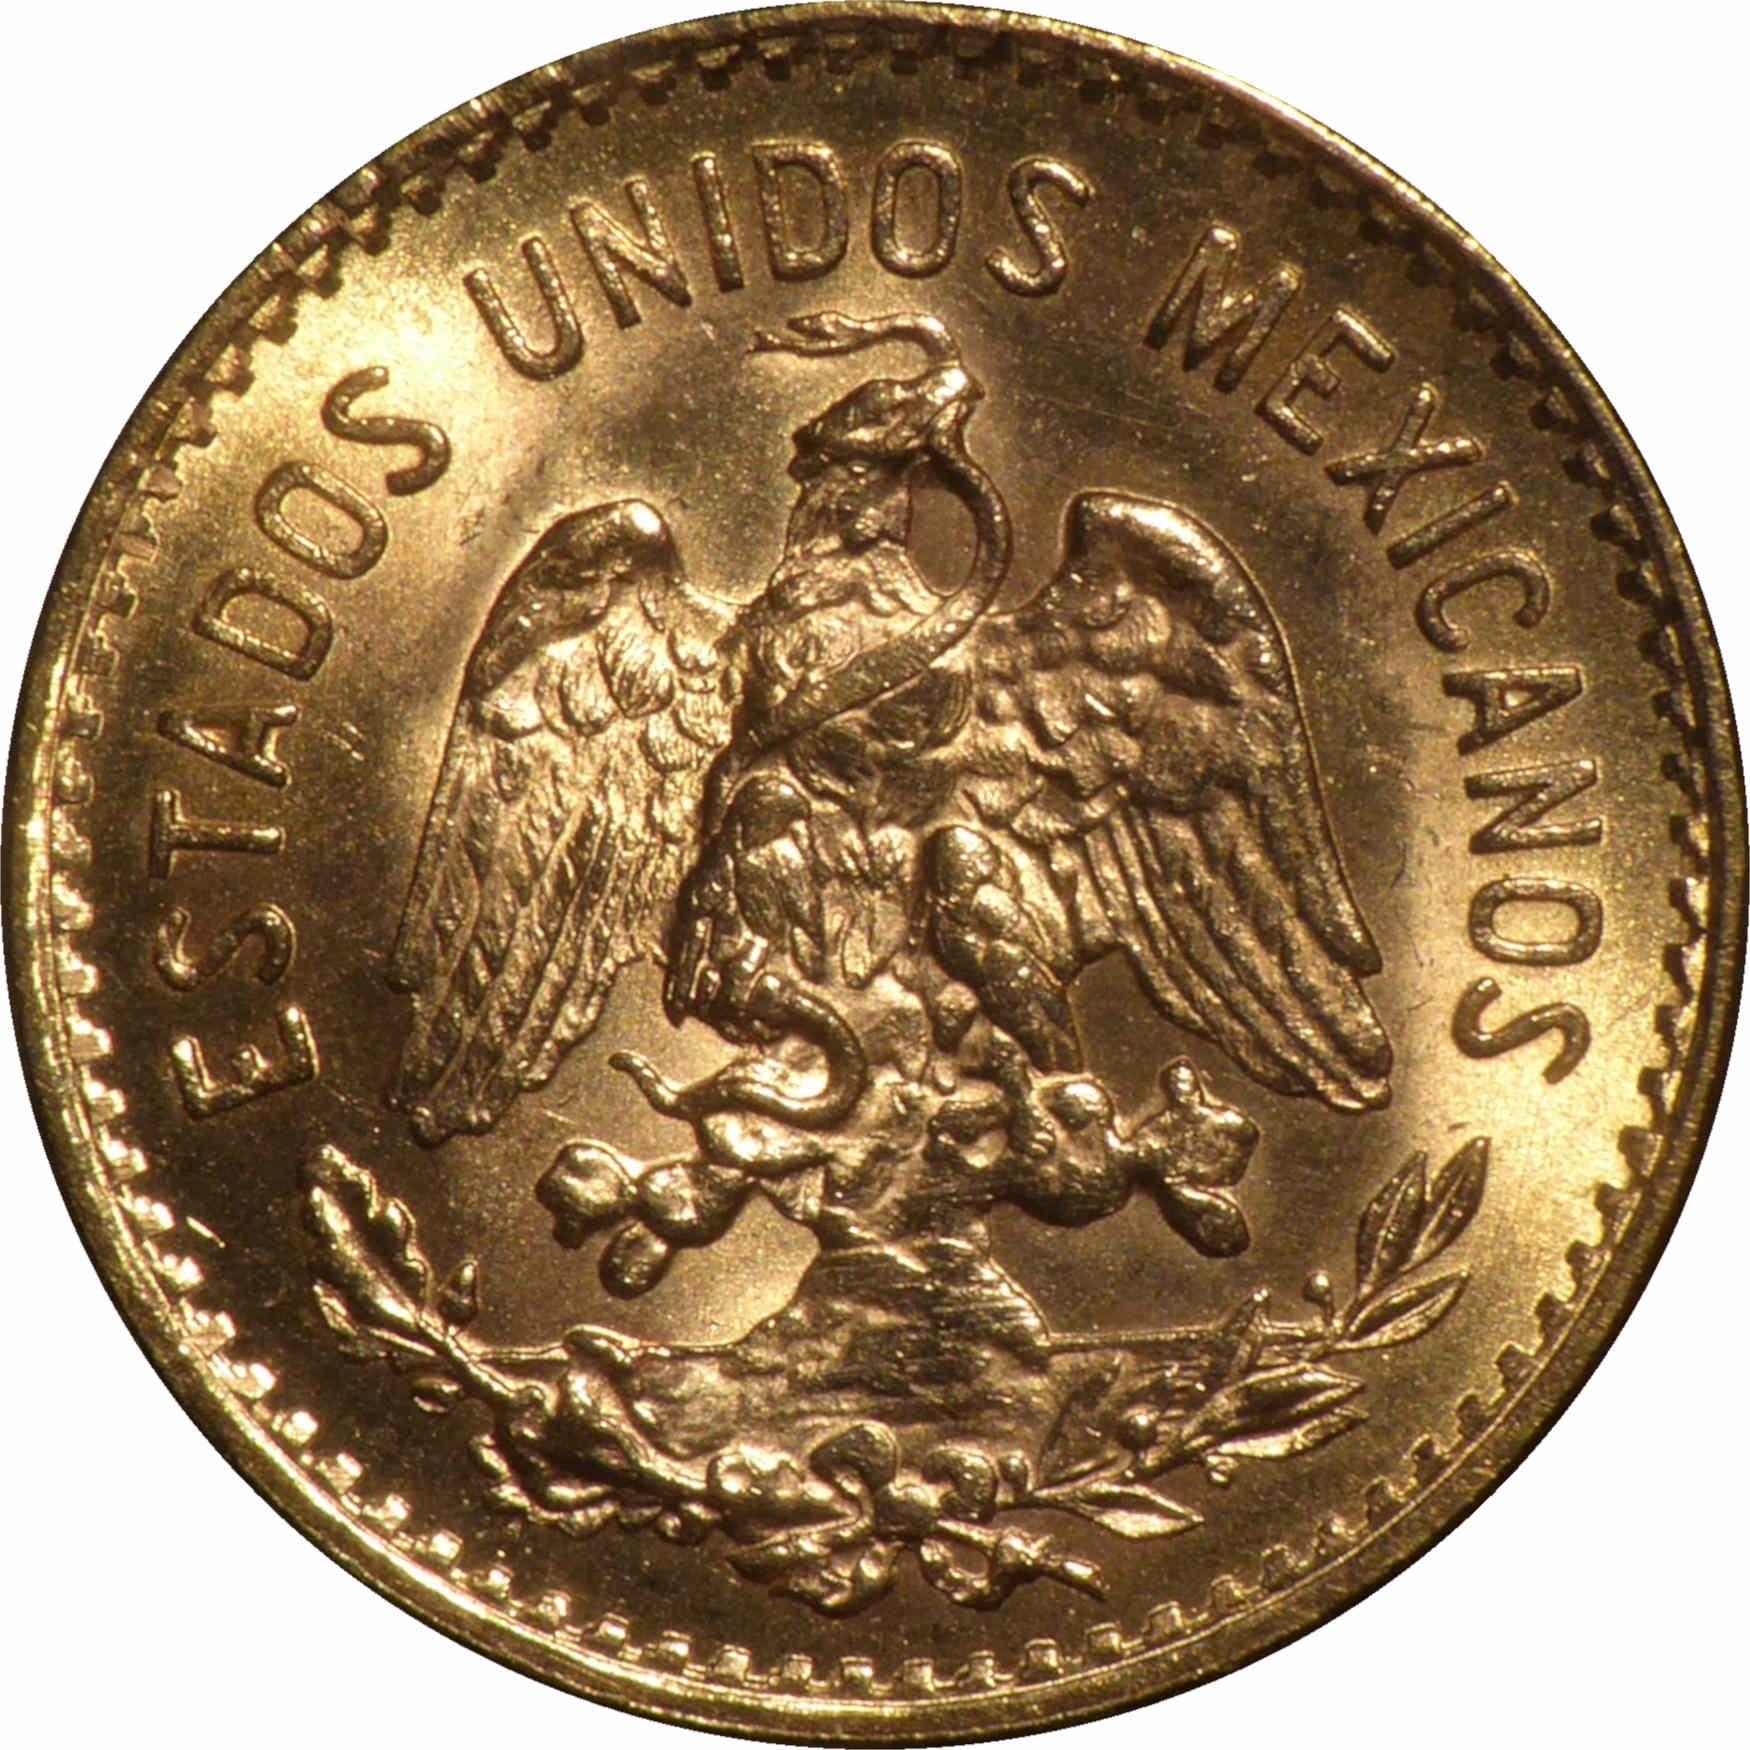 Mexico 5 Pesos (1905-1955)